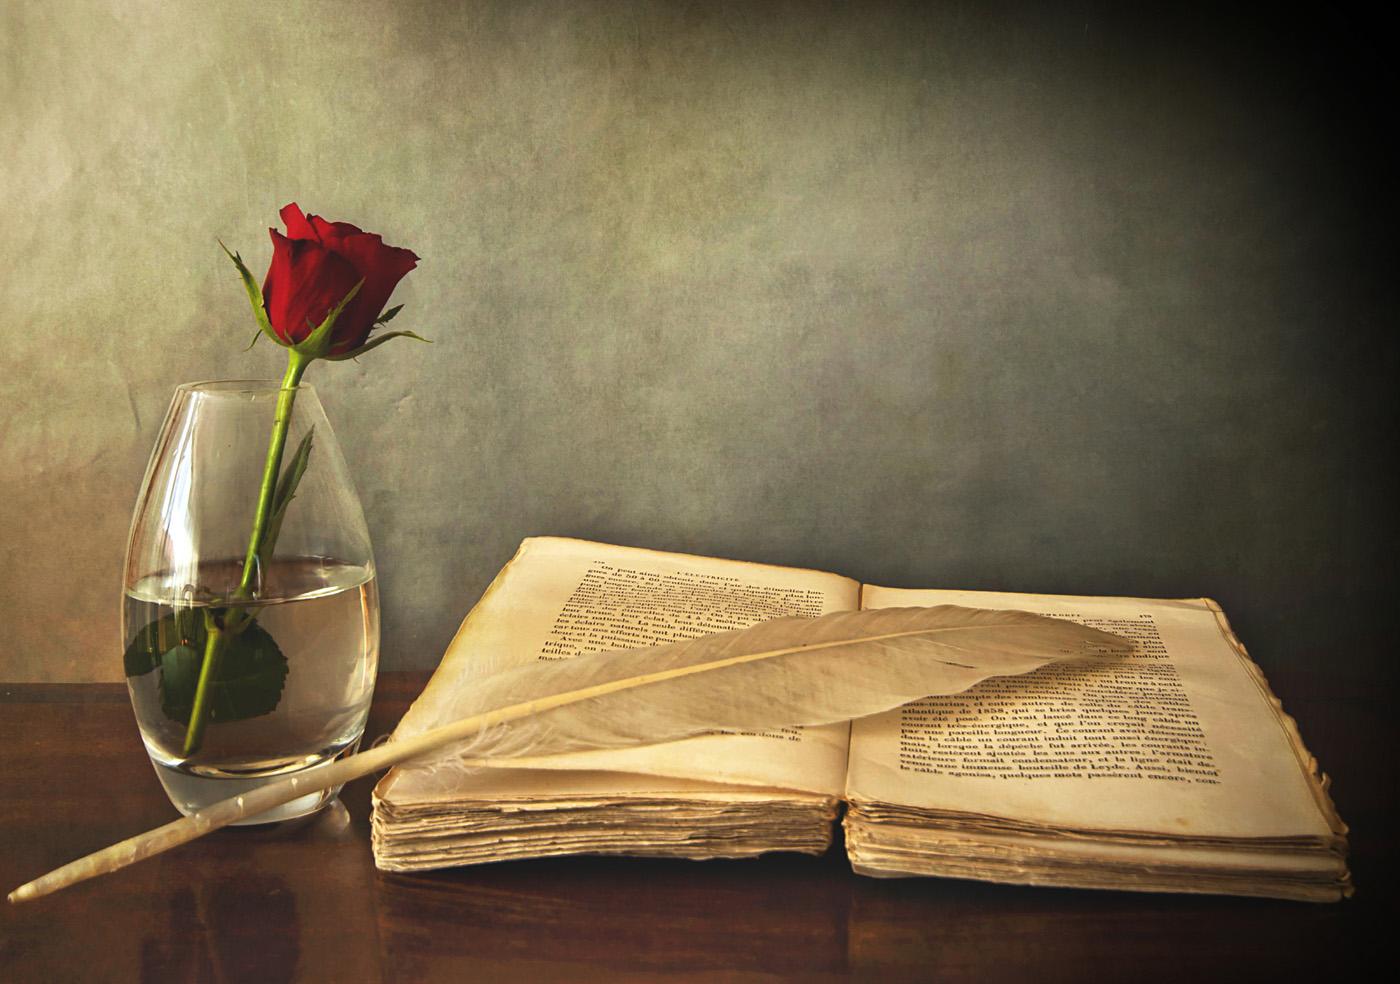 Partner of Life: Buku Tua Yang Tak Bosan Dibaca